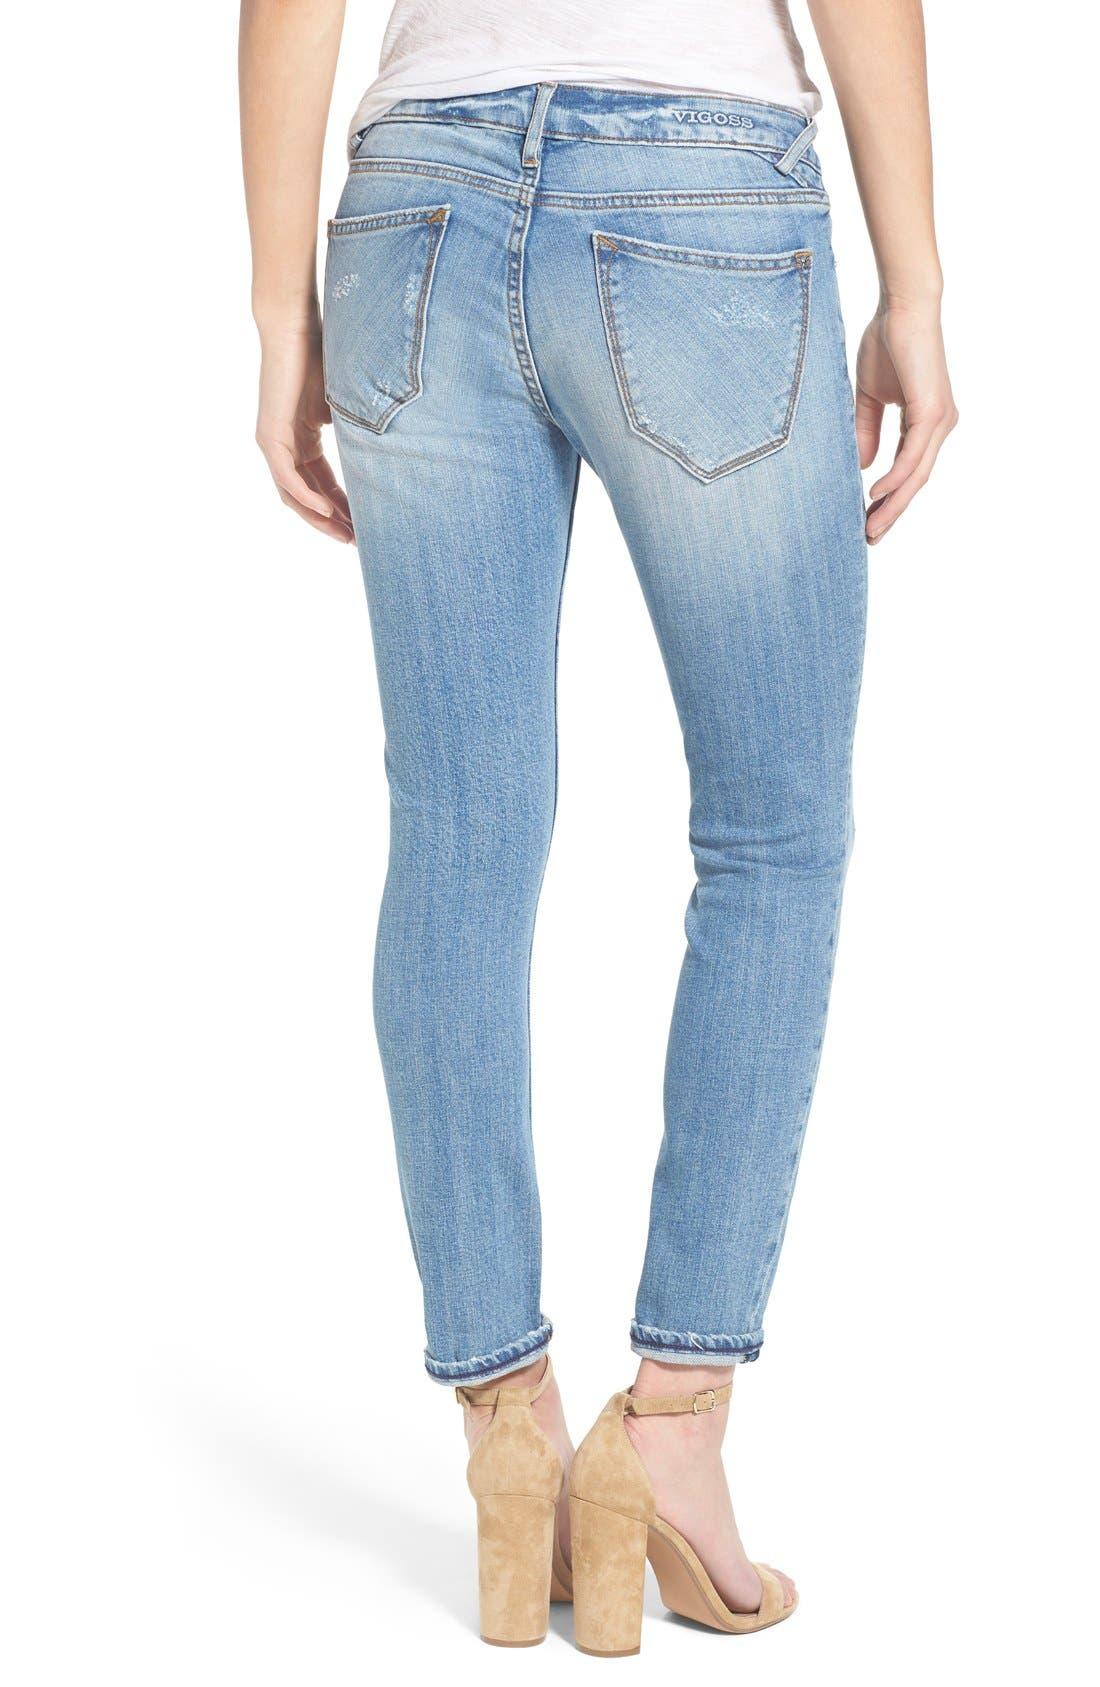 Alternate Image 2  - Vigoss 'Tomboy 'Thompson' Distressed Boyfriend Jeans